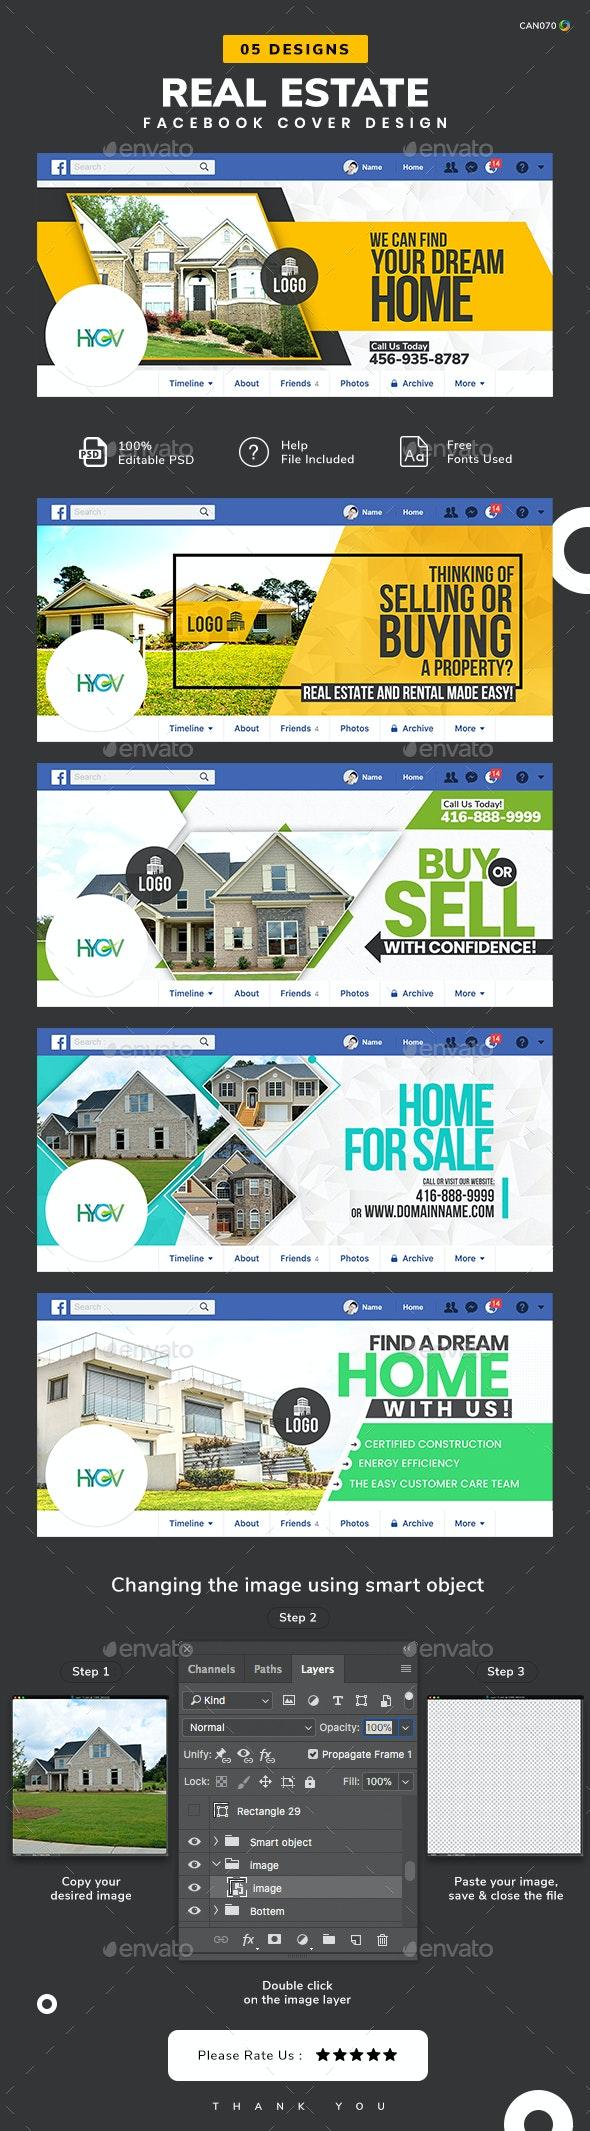 Real Estate Facebook Cover Templates - 05 Designs - Facebook Timeline Covers Social Media